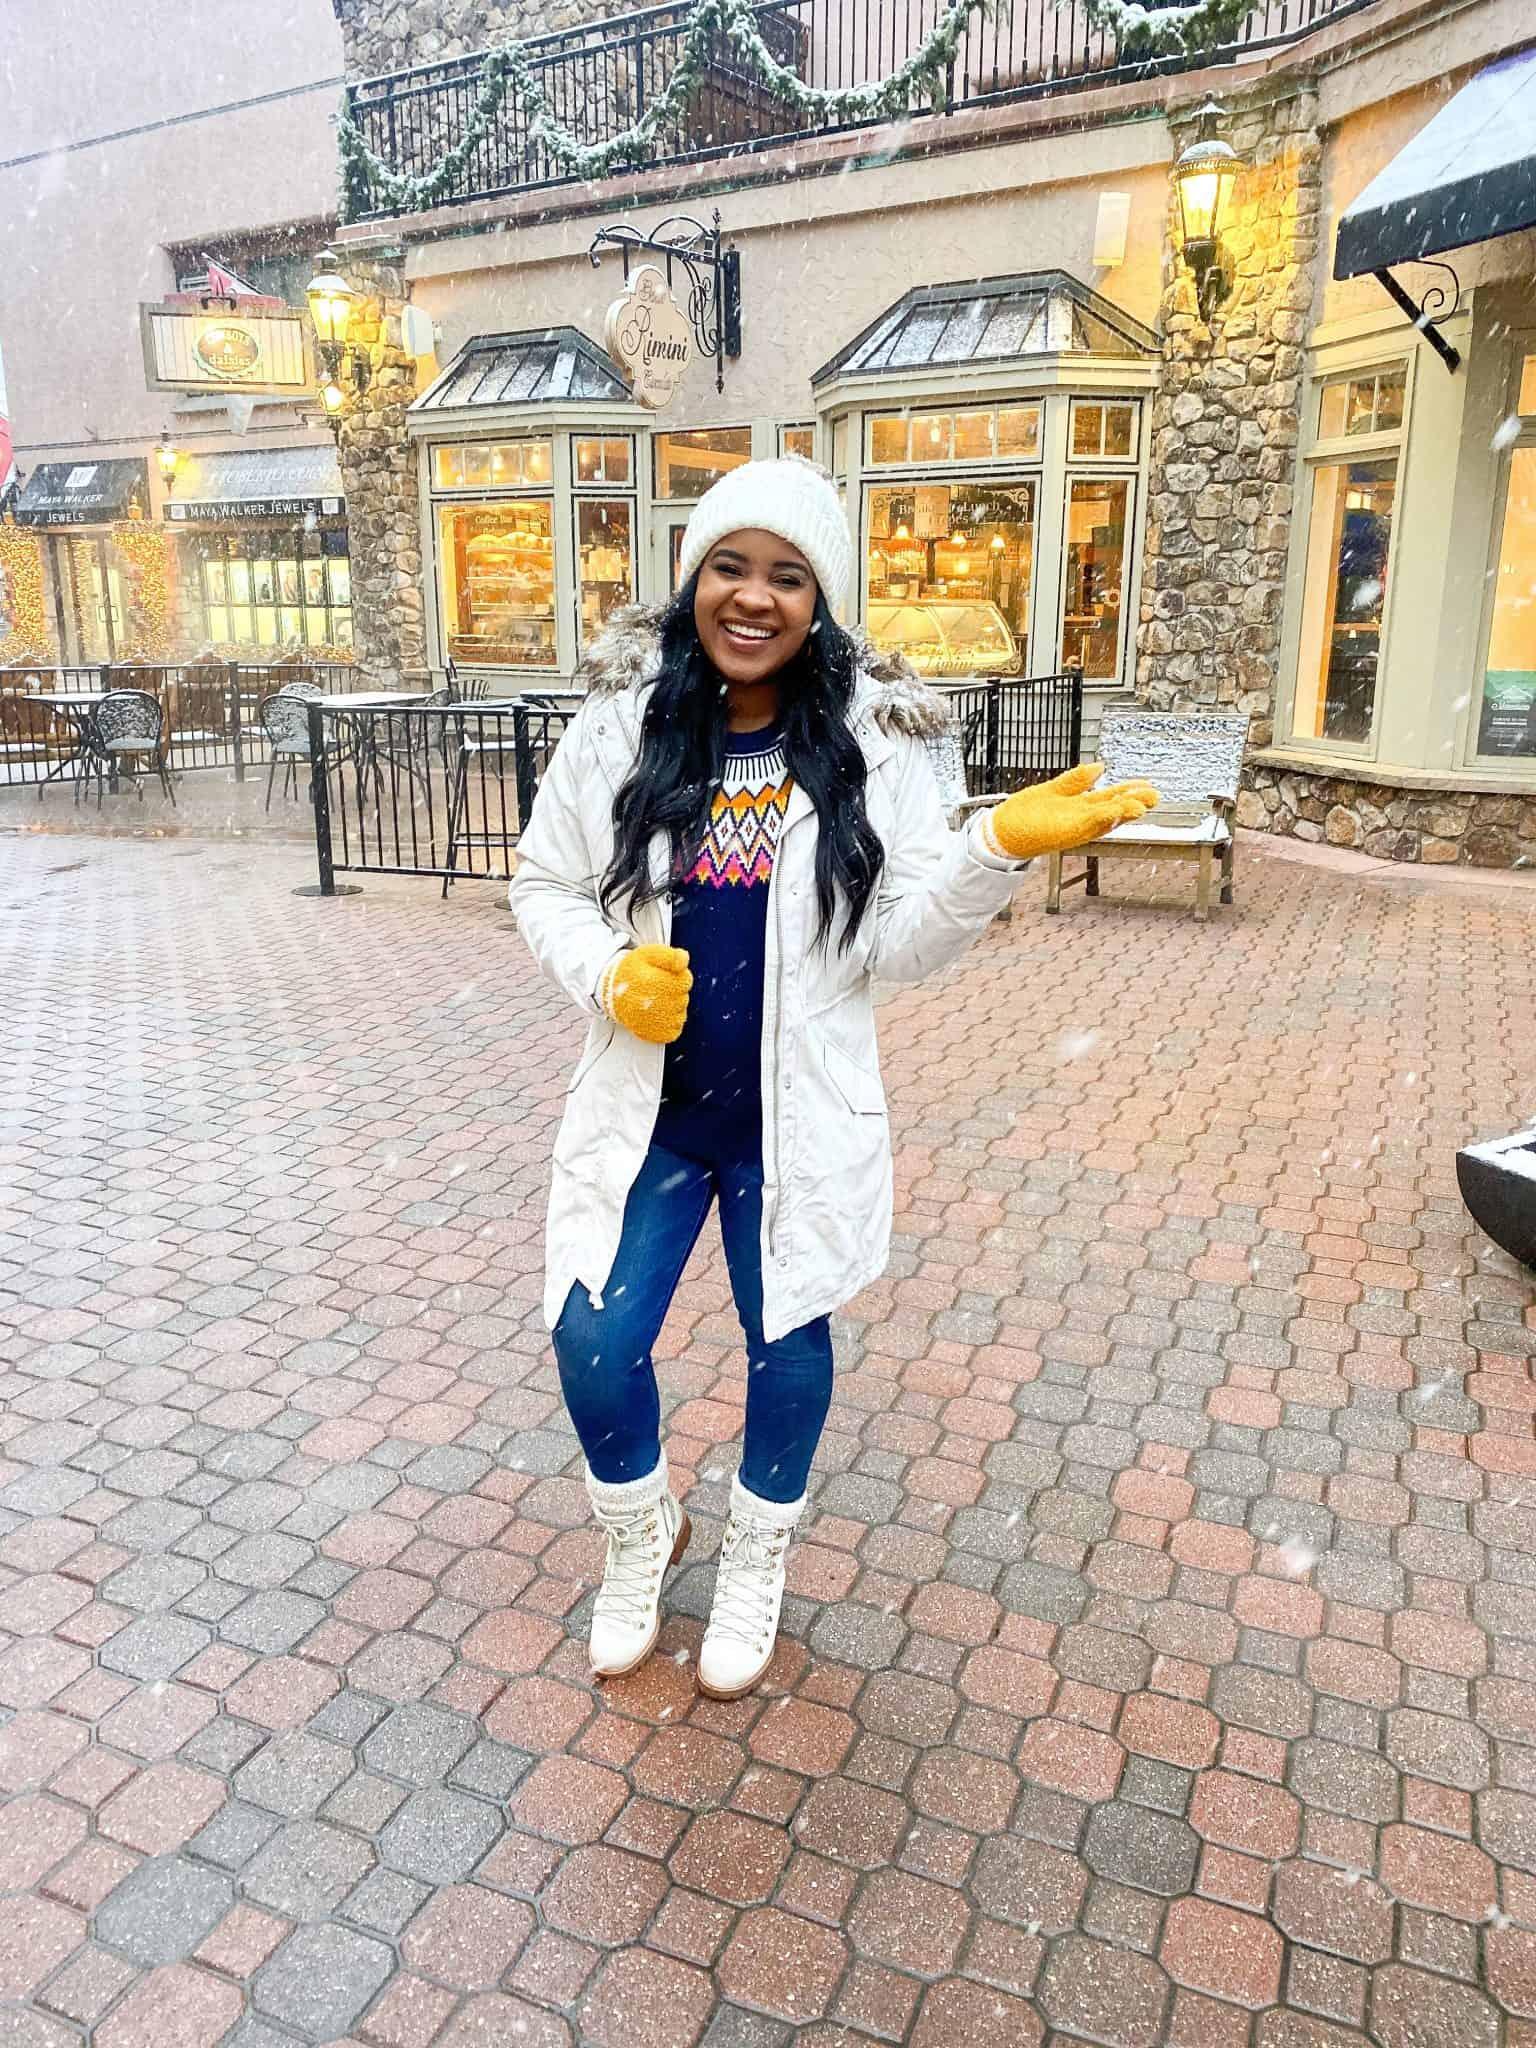 Family Ski Trip Packing List by popular Dallas travel blog, Glamorous Versatility: image of a woman standing outside at Beaver Creek ski resort.